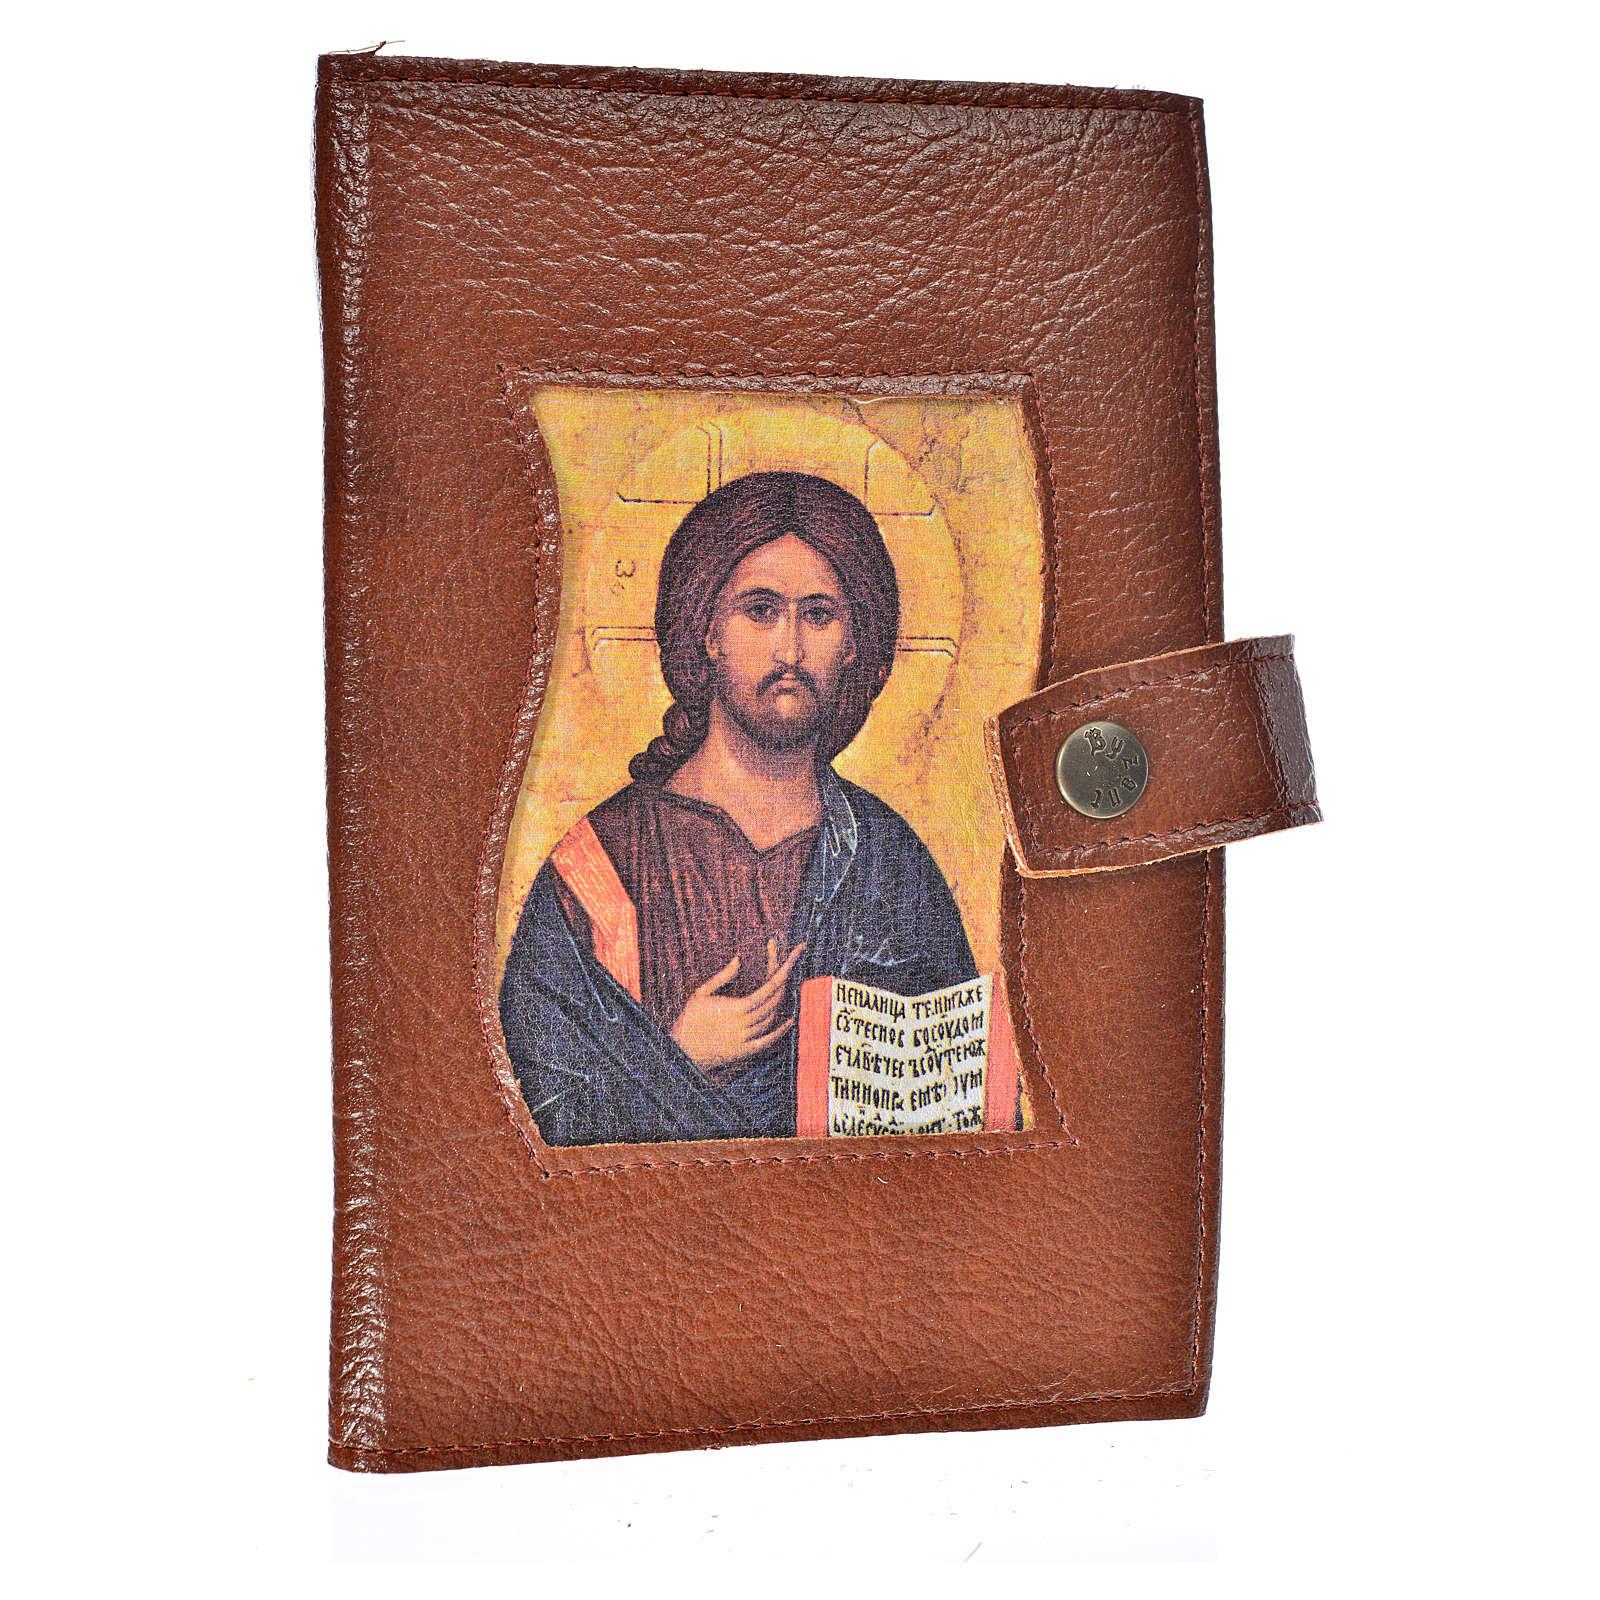 Funda Biblia Jerusalén Nueva Ed. simil Cristo Libro cerrado 4